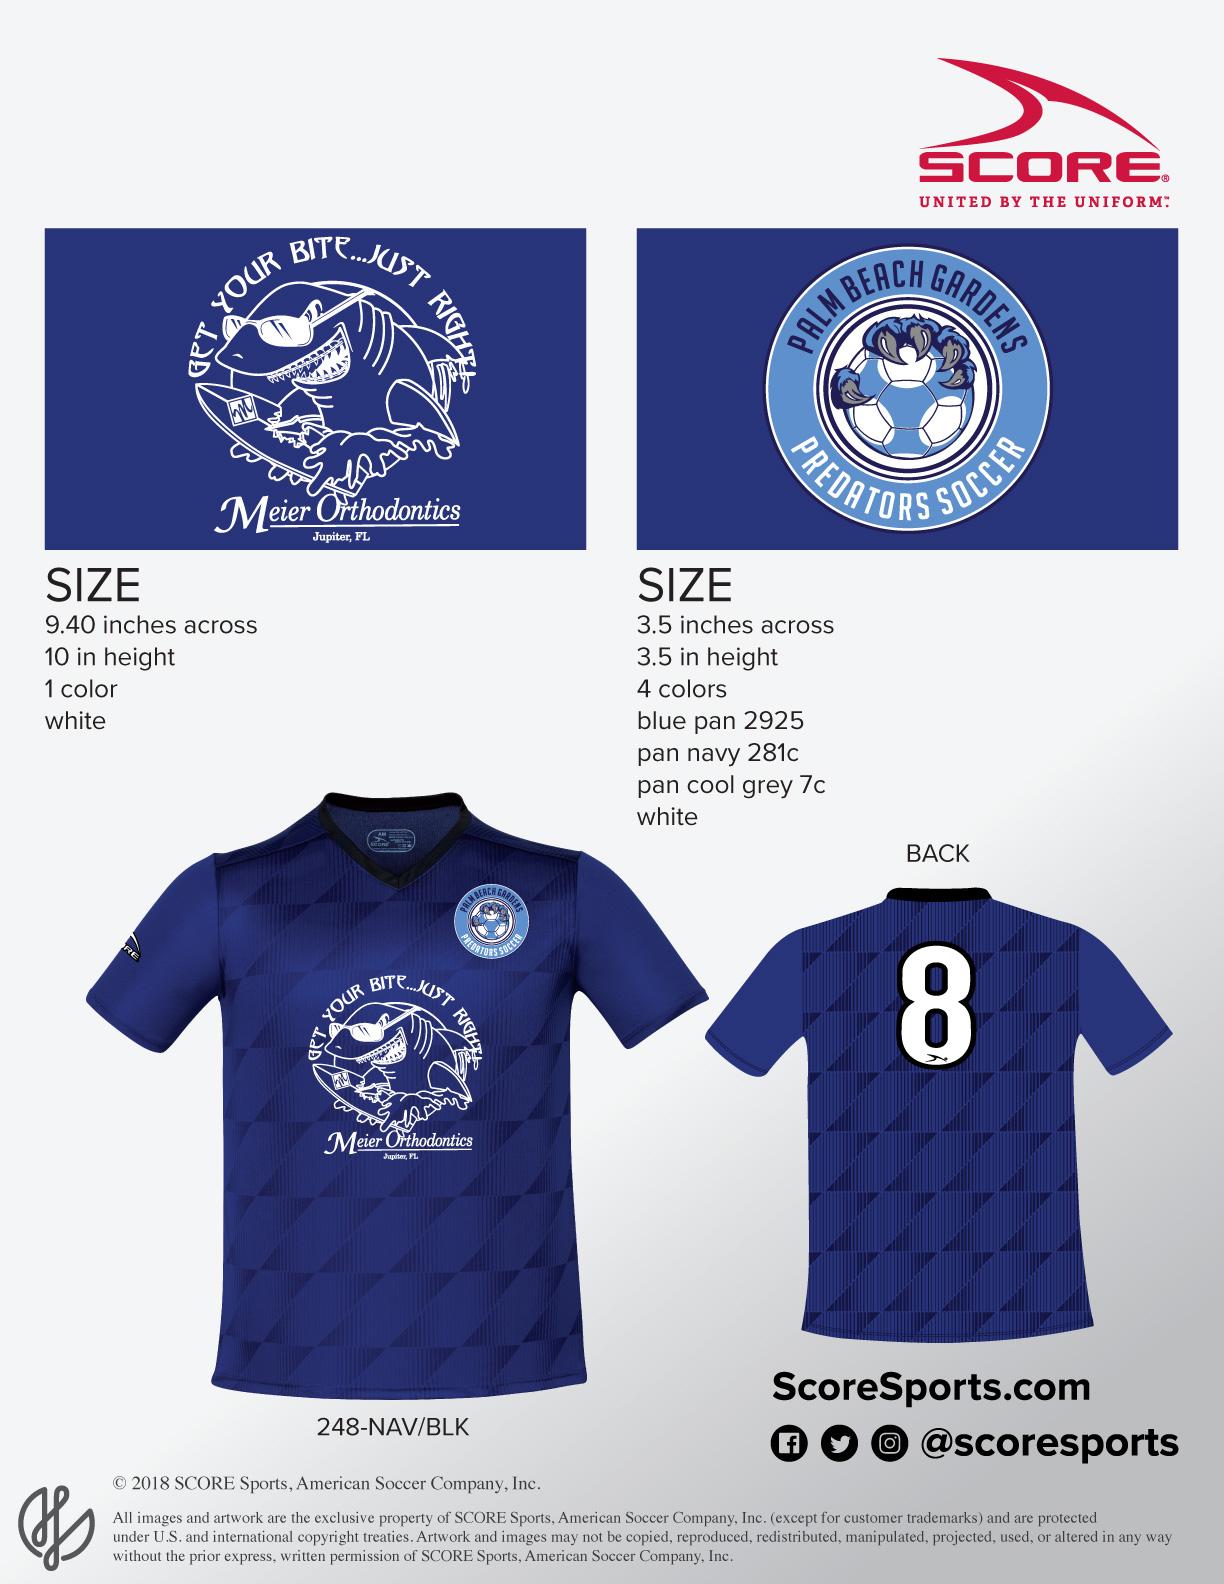 ScoreSports